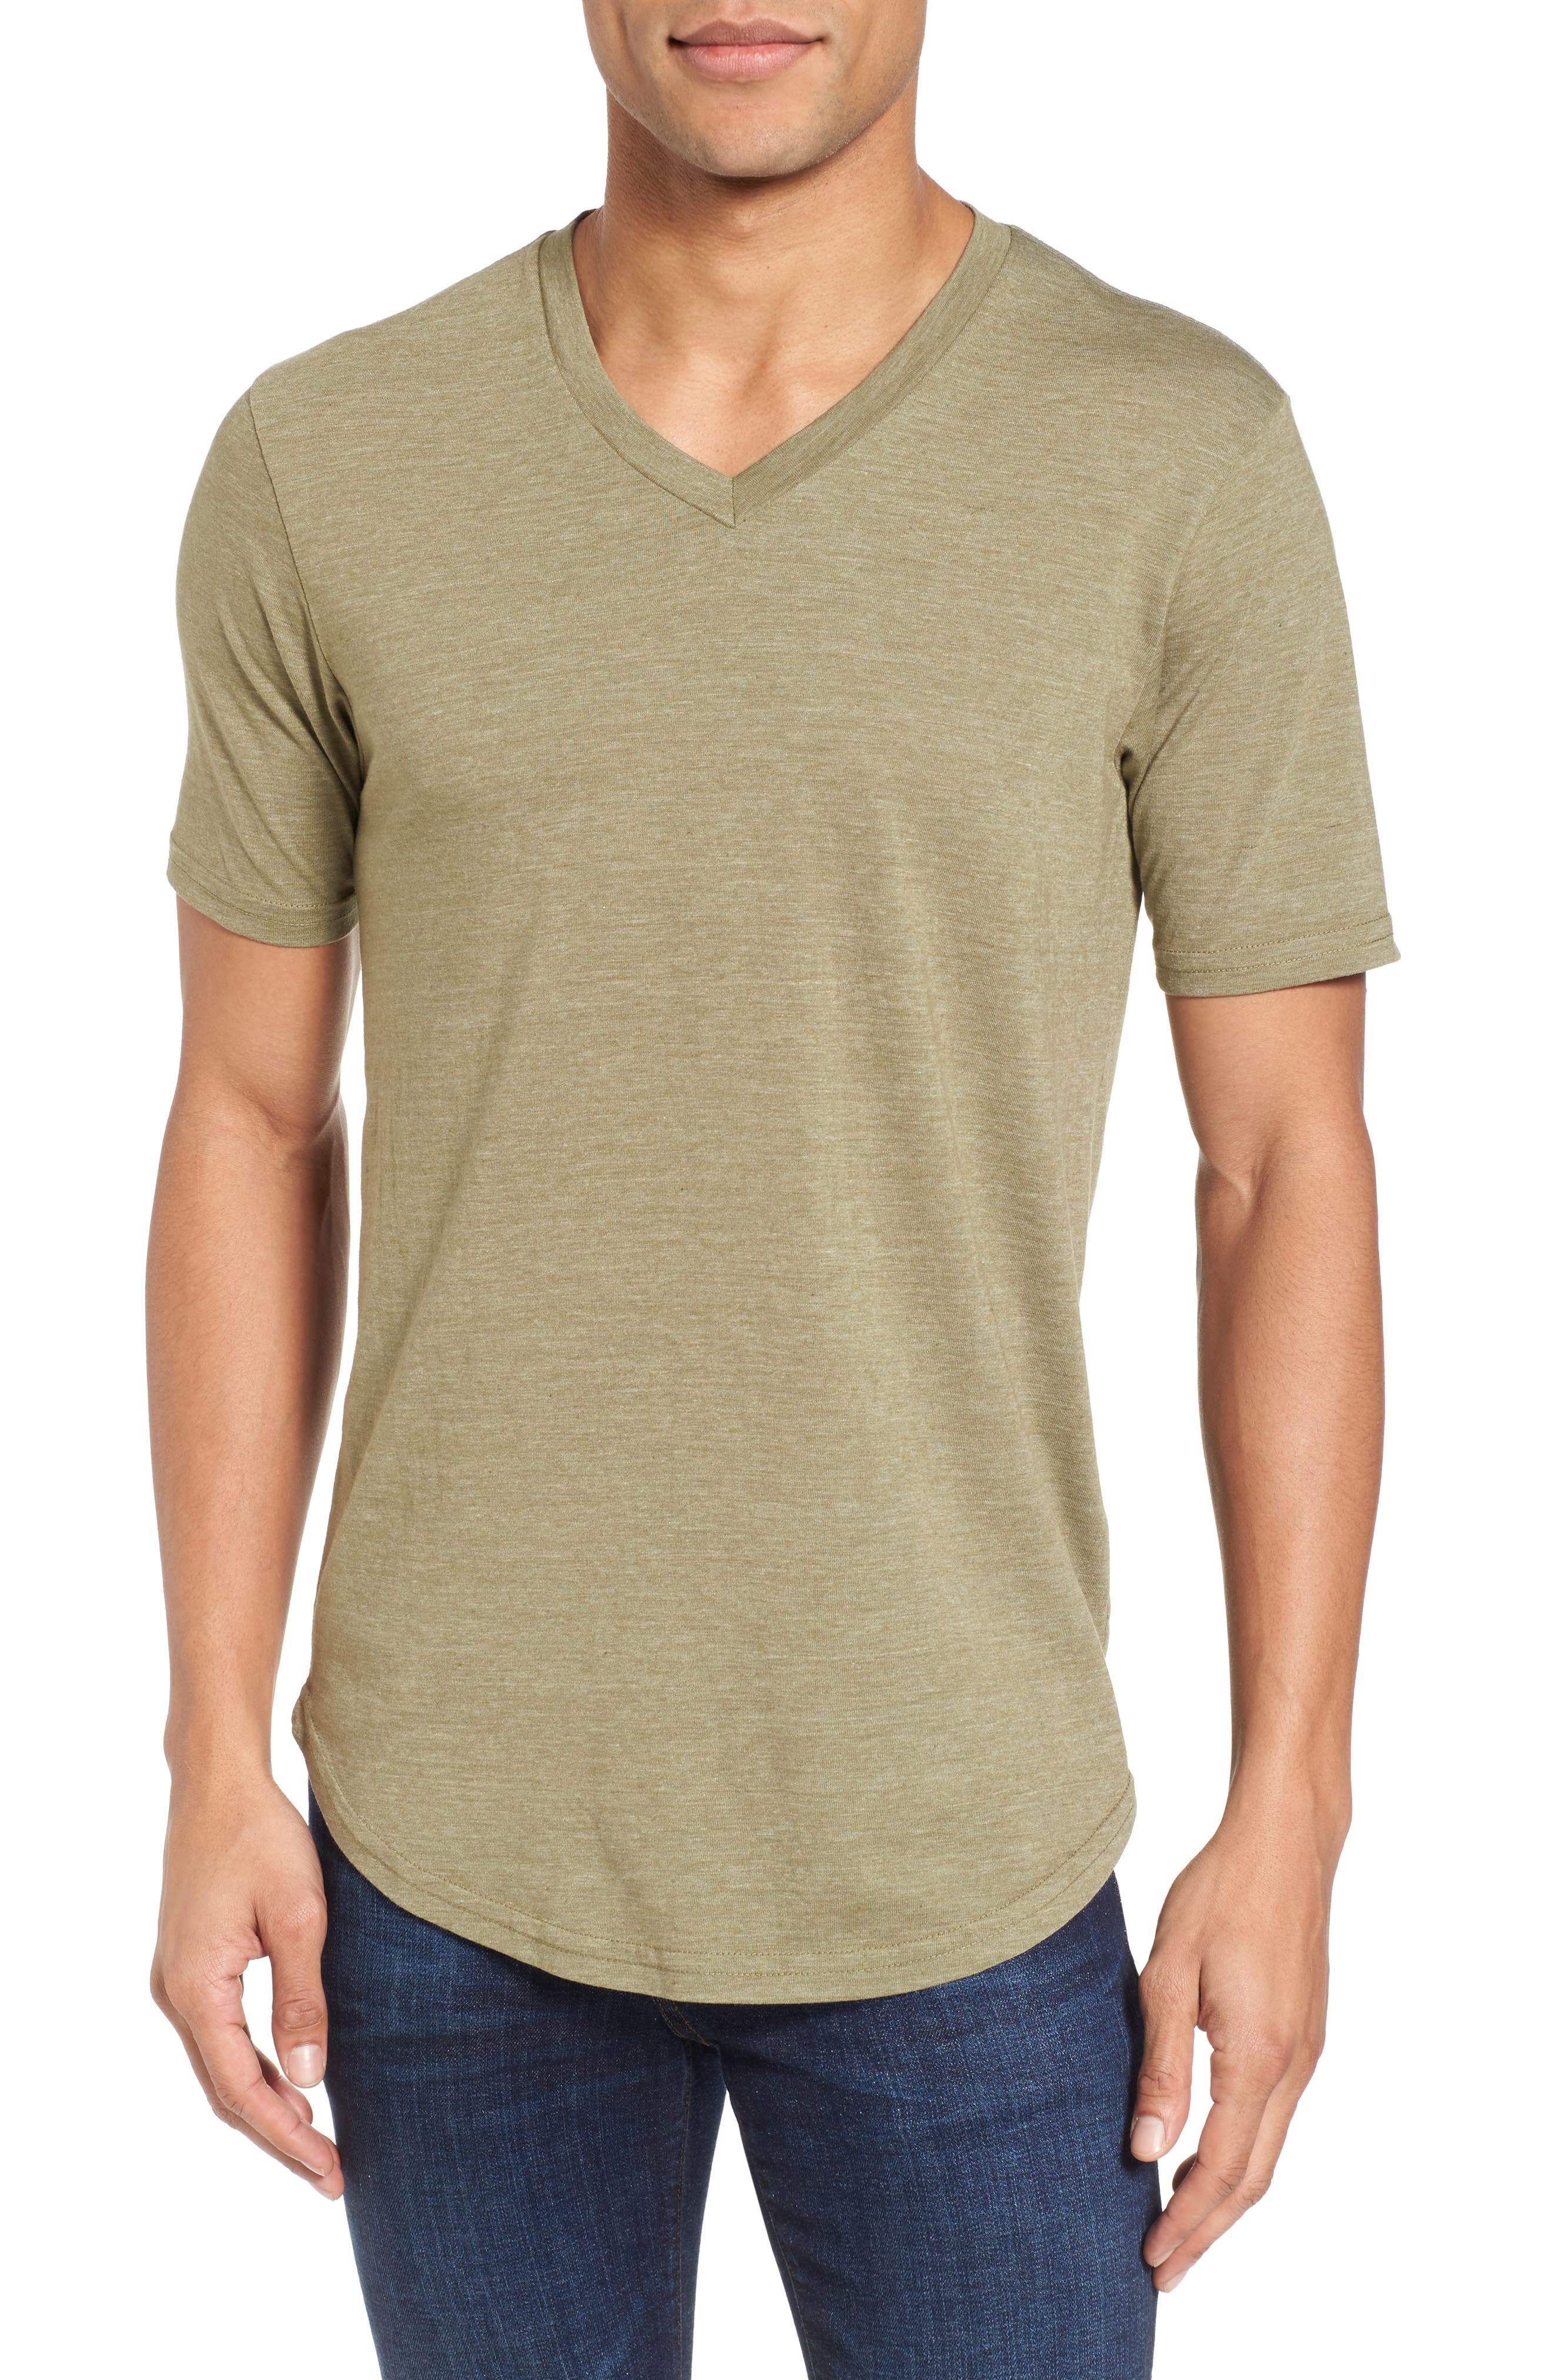 Main Image - Goodlife Scallop Triblend V-Neck T-Shirt